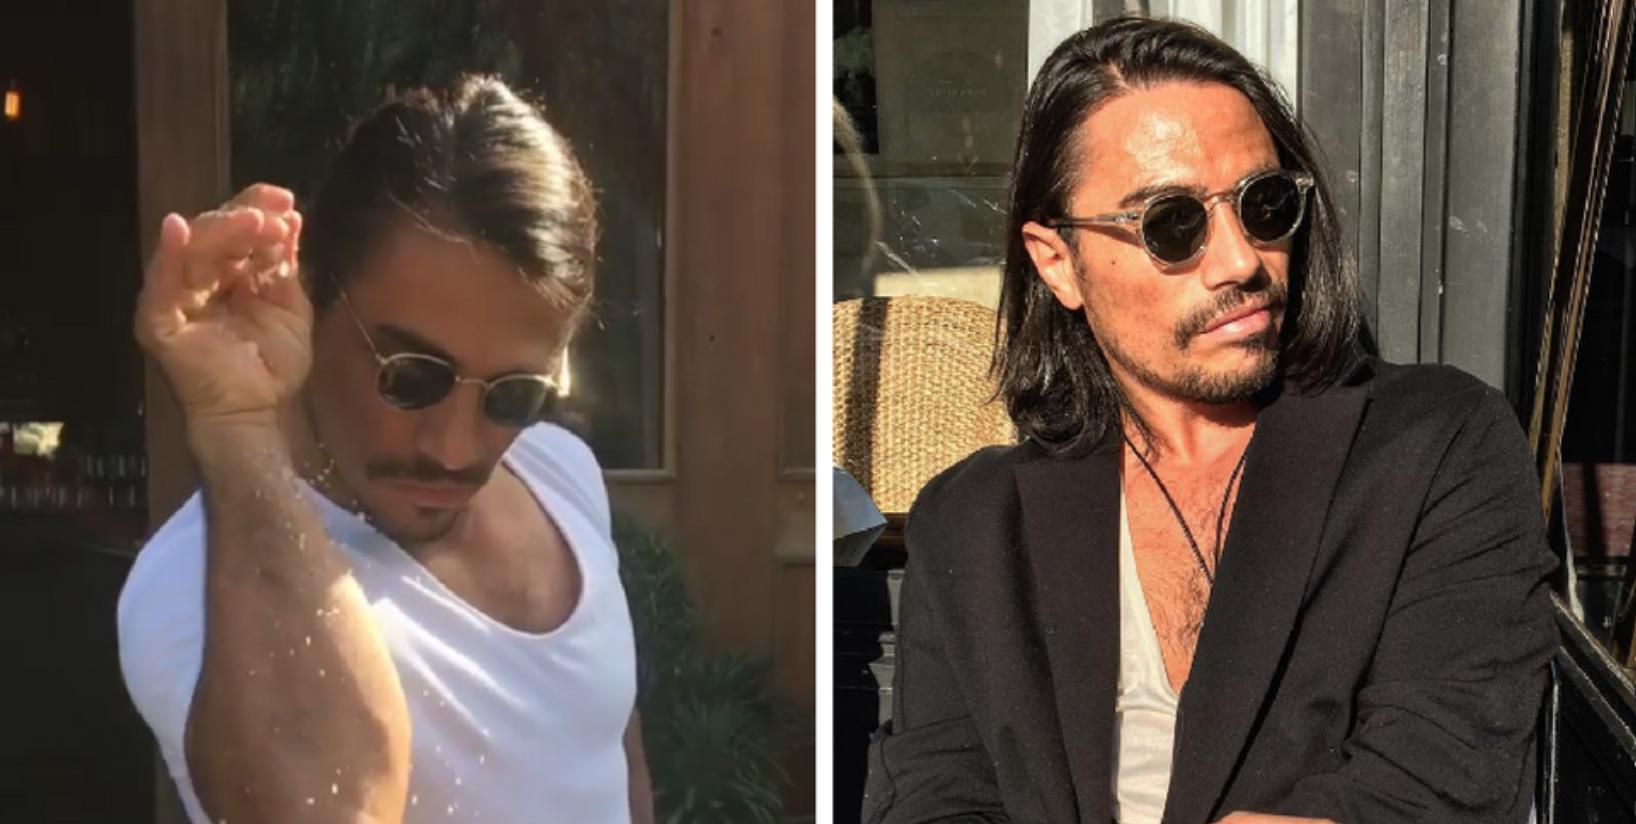 What Sunglasses Does Salt Bae Wear In His Instagram Videos?